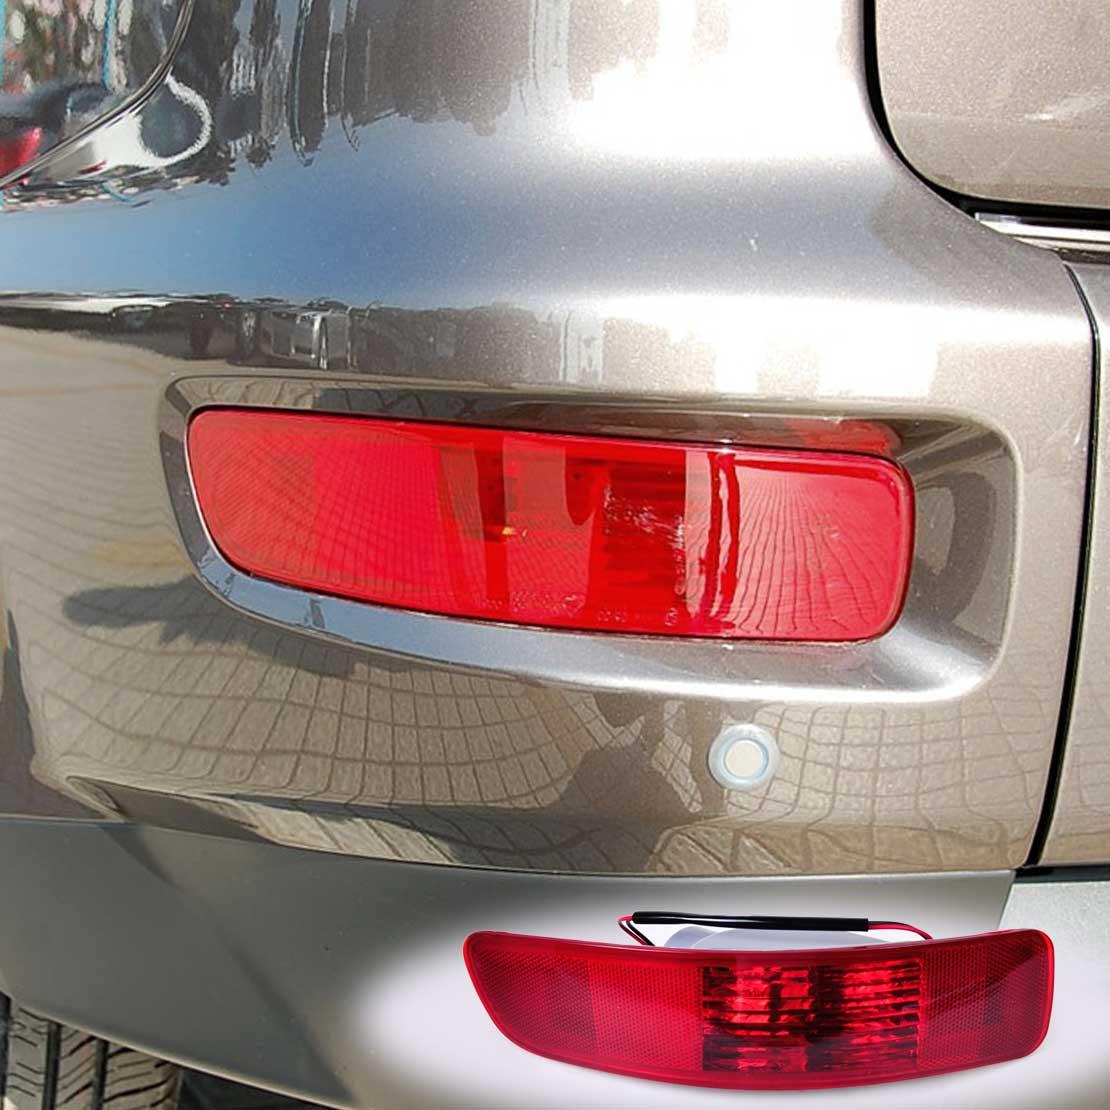 beler 1Pc New Rear Fog Lamp Light Left Side SL693-LH SL693 Fit for Mitsubishi Outlander 2007 2008 2009 2010 2011 2012 2013 free shipping for vw passat b6 2006 2007 2008 2009 2010 2011 new front left and right side high quality 9 led fog lamp fog light